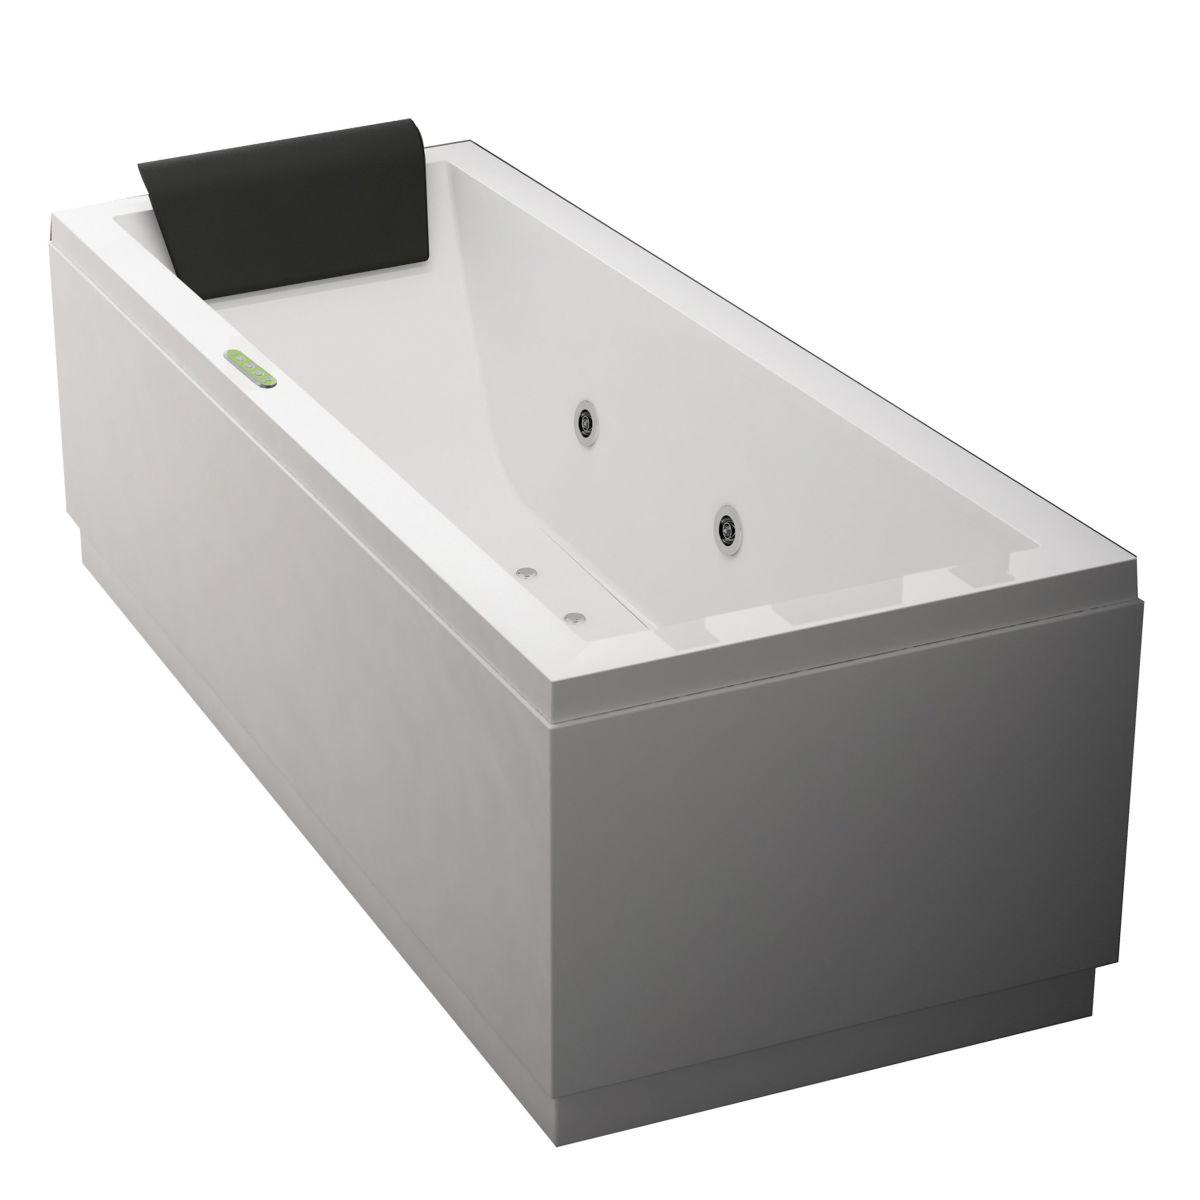 Prezzi vasche da bagno piccole vasca incasso x cm sal in - Vasche da bagno leroy merlin ...